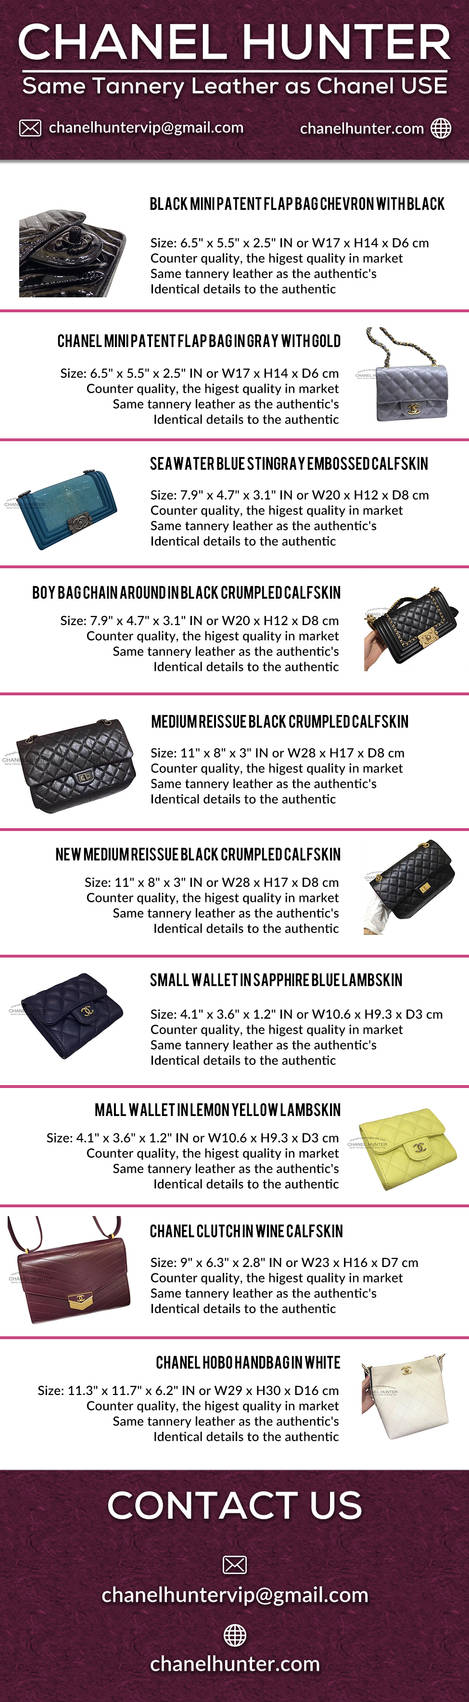 1c8ca1de2951 Buy The Best Chanel Replica Bags Online by chanelhunter